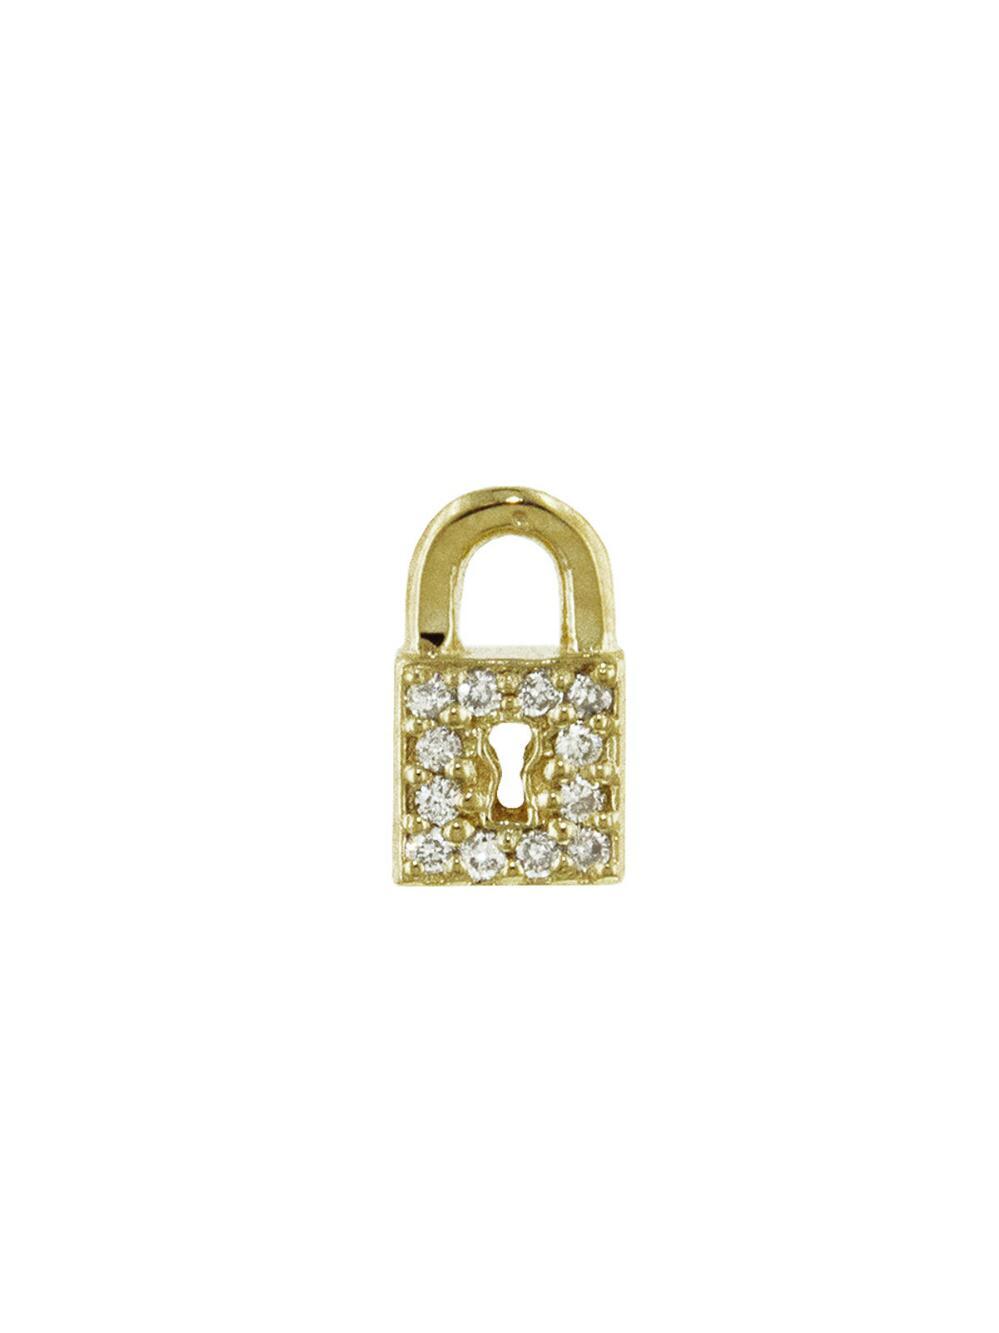 Sydney Evan Small Key Hole Lock Studs 8opoc